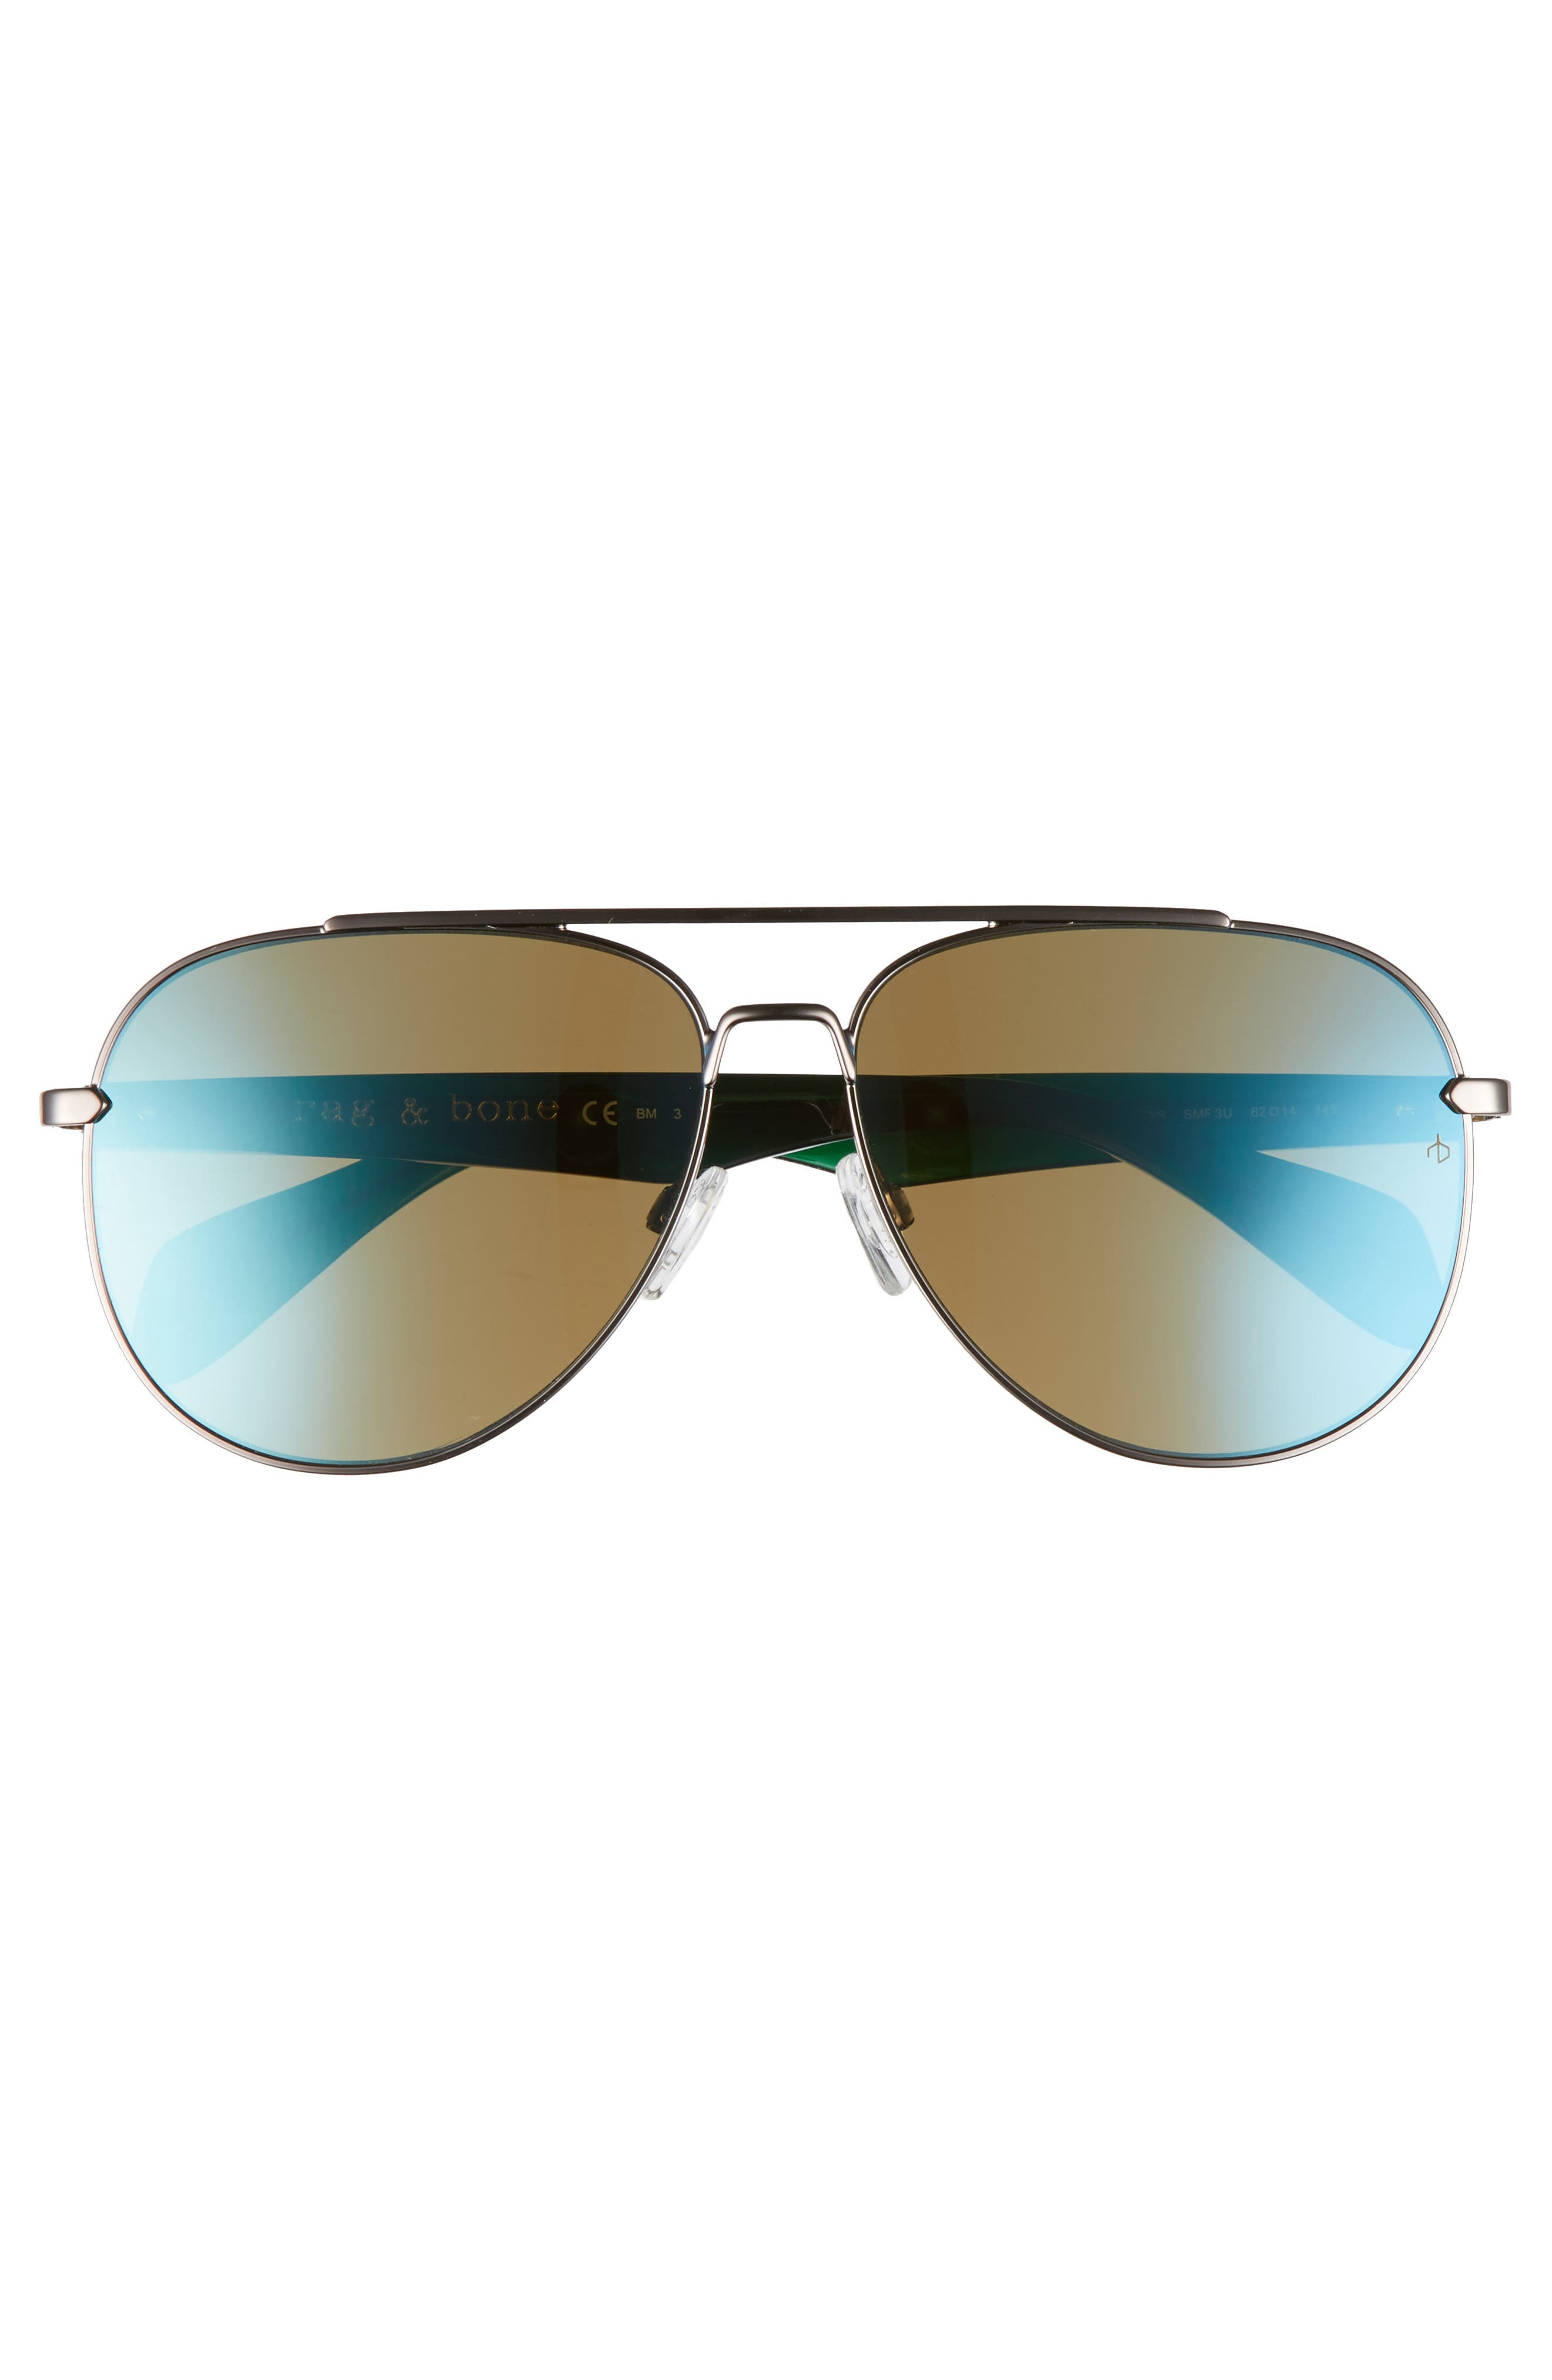 62mm Mirrored Aviator Sunglasses,                             Alternate thumbnail 2, color,                             Ruthenium Khaki/ Blue